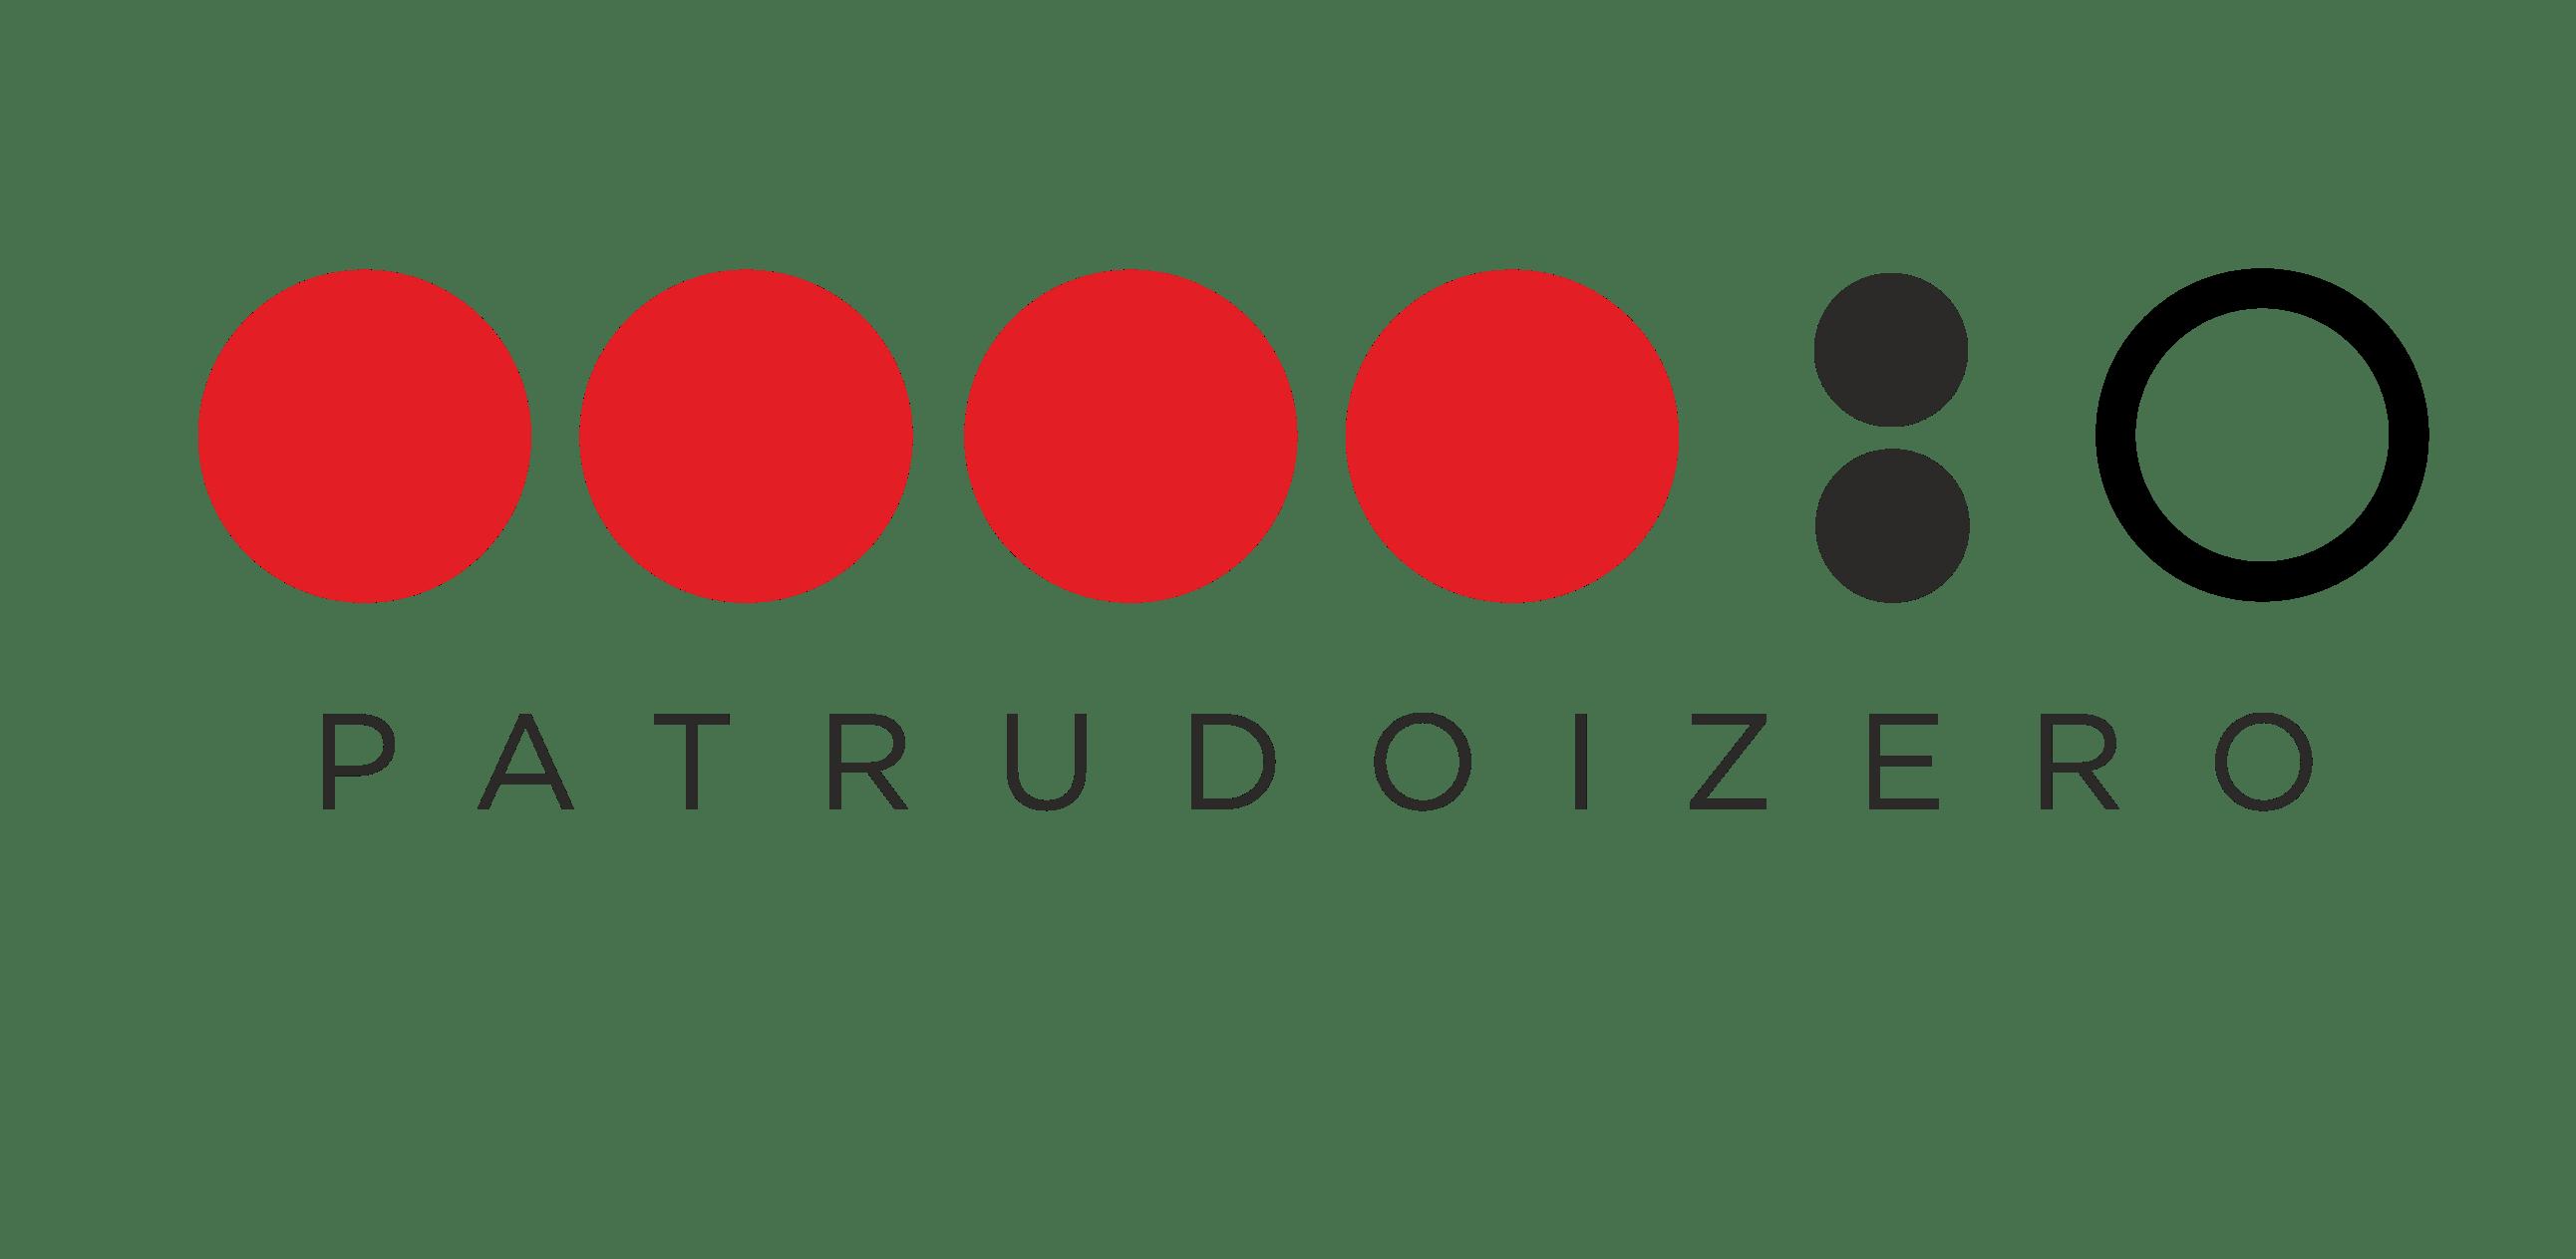 Patrudoizero Design